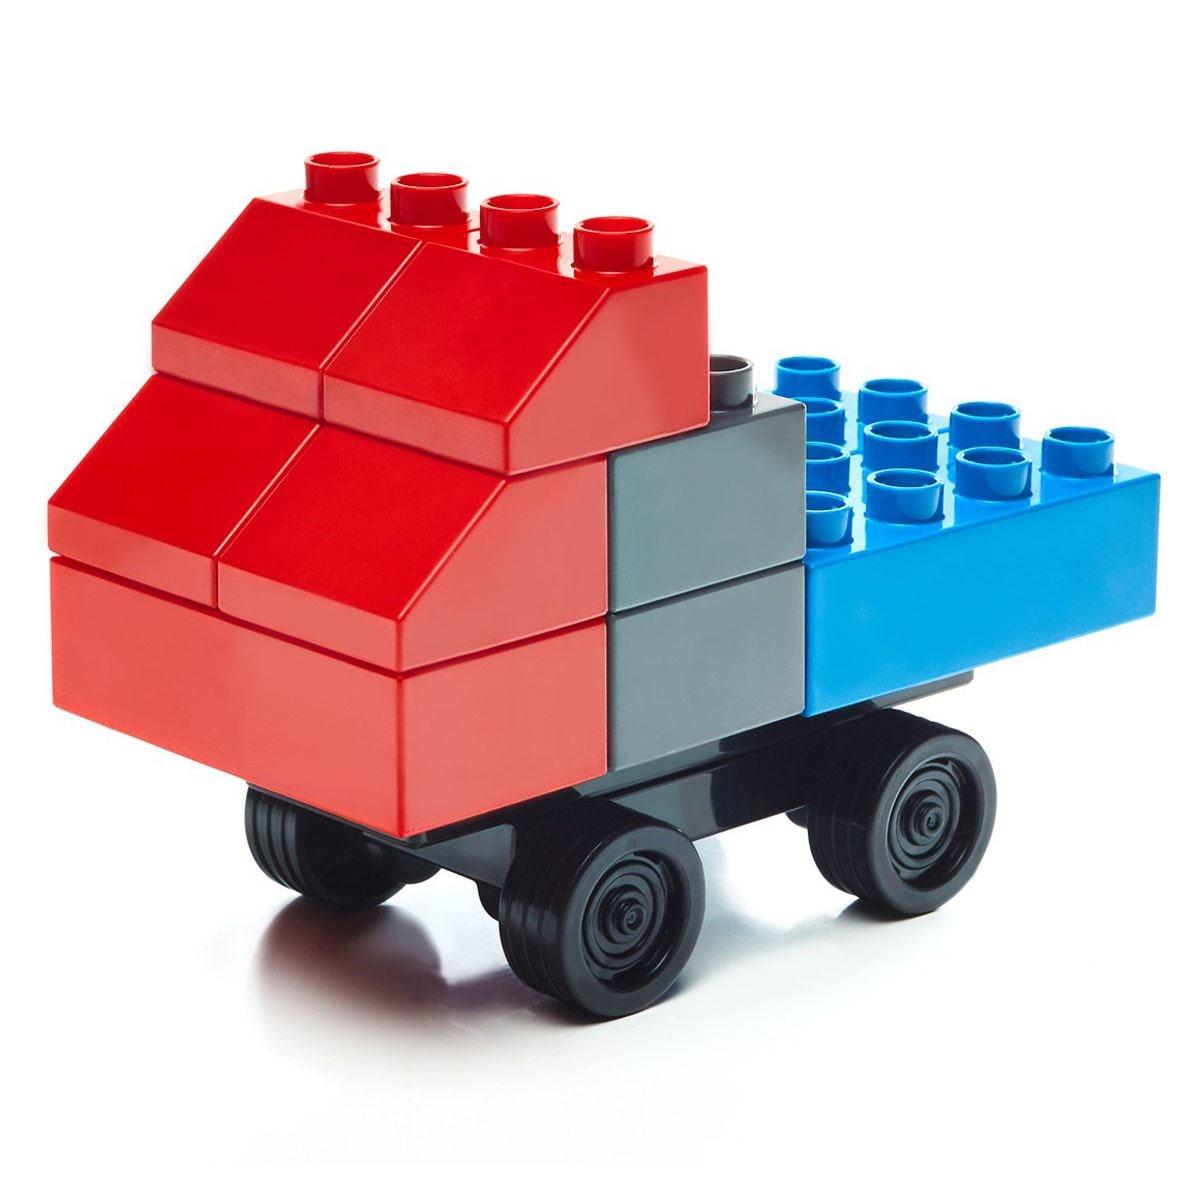 Mega Bloks Vamos a Construir Caja Gigante